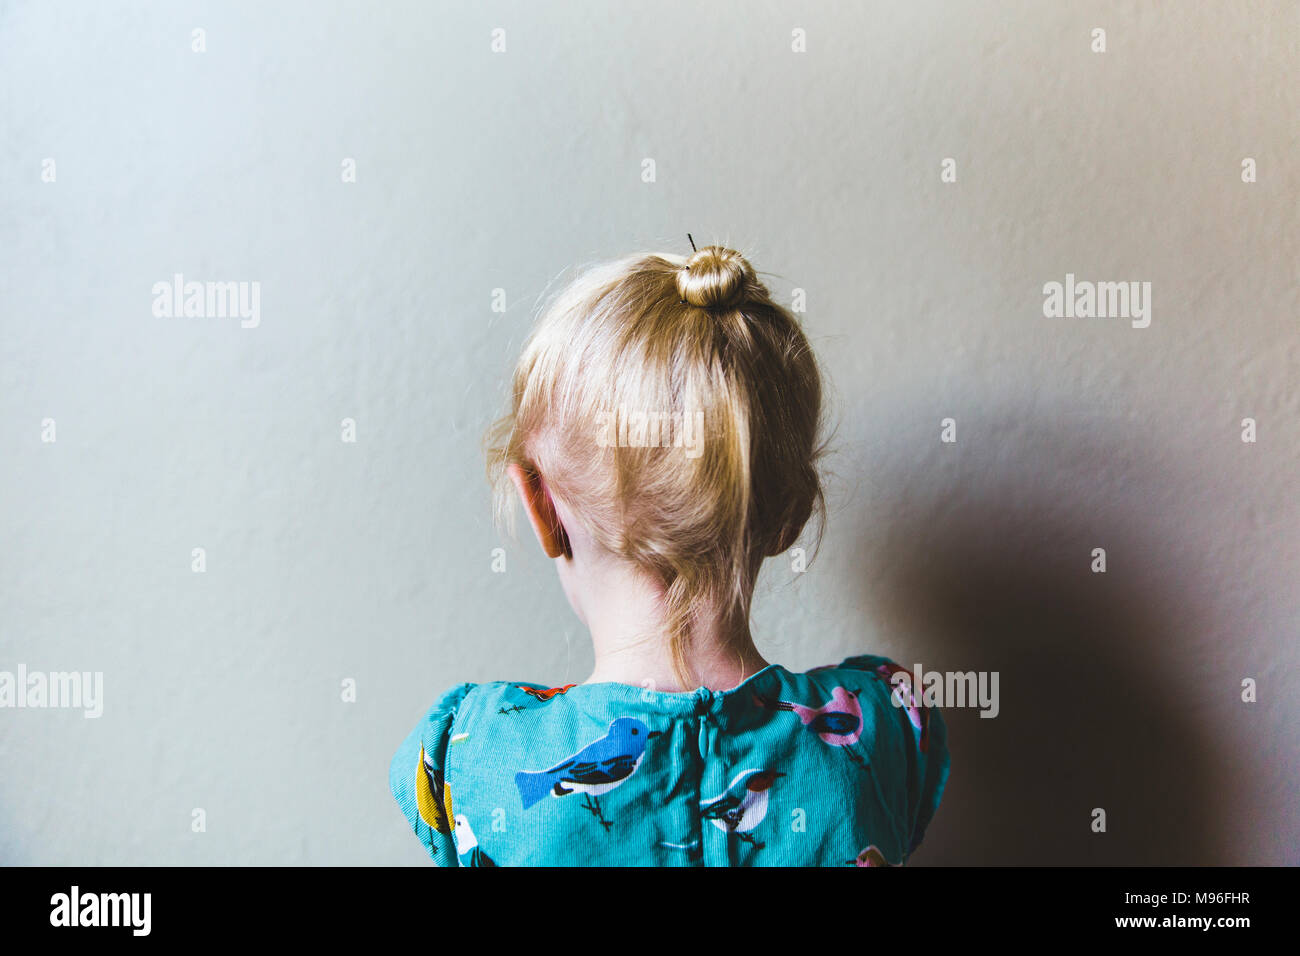 Parte posterior de la cabeza de niña Imagen De Stock